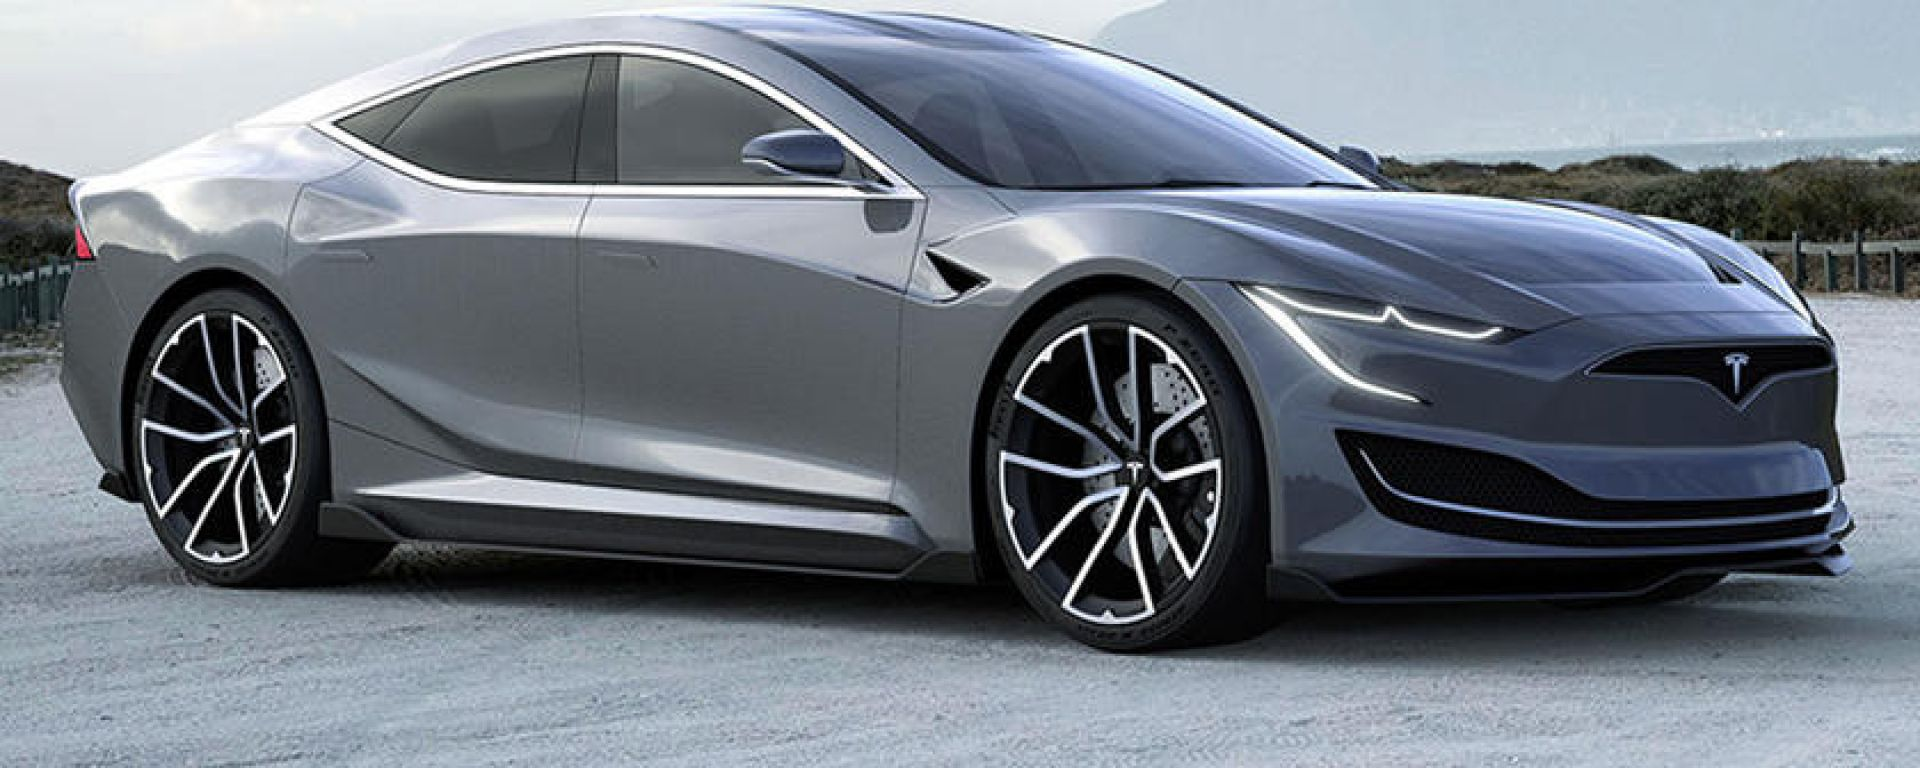 NUova Tesla Model S: allo studio la nuova super berlina elettrica americana